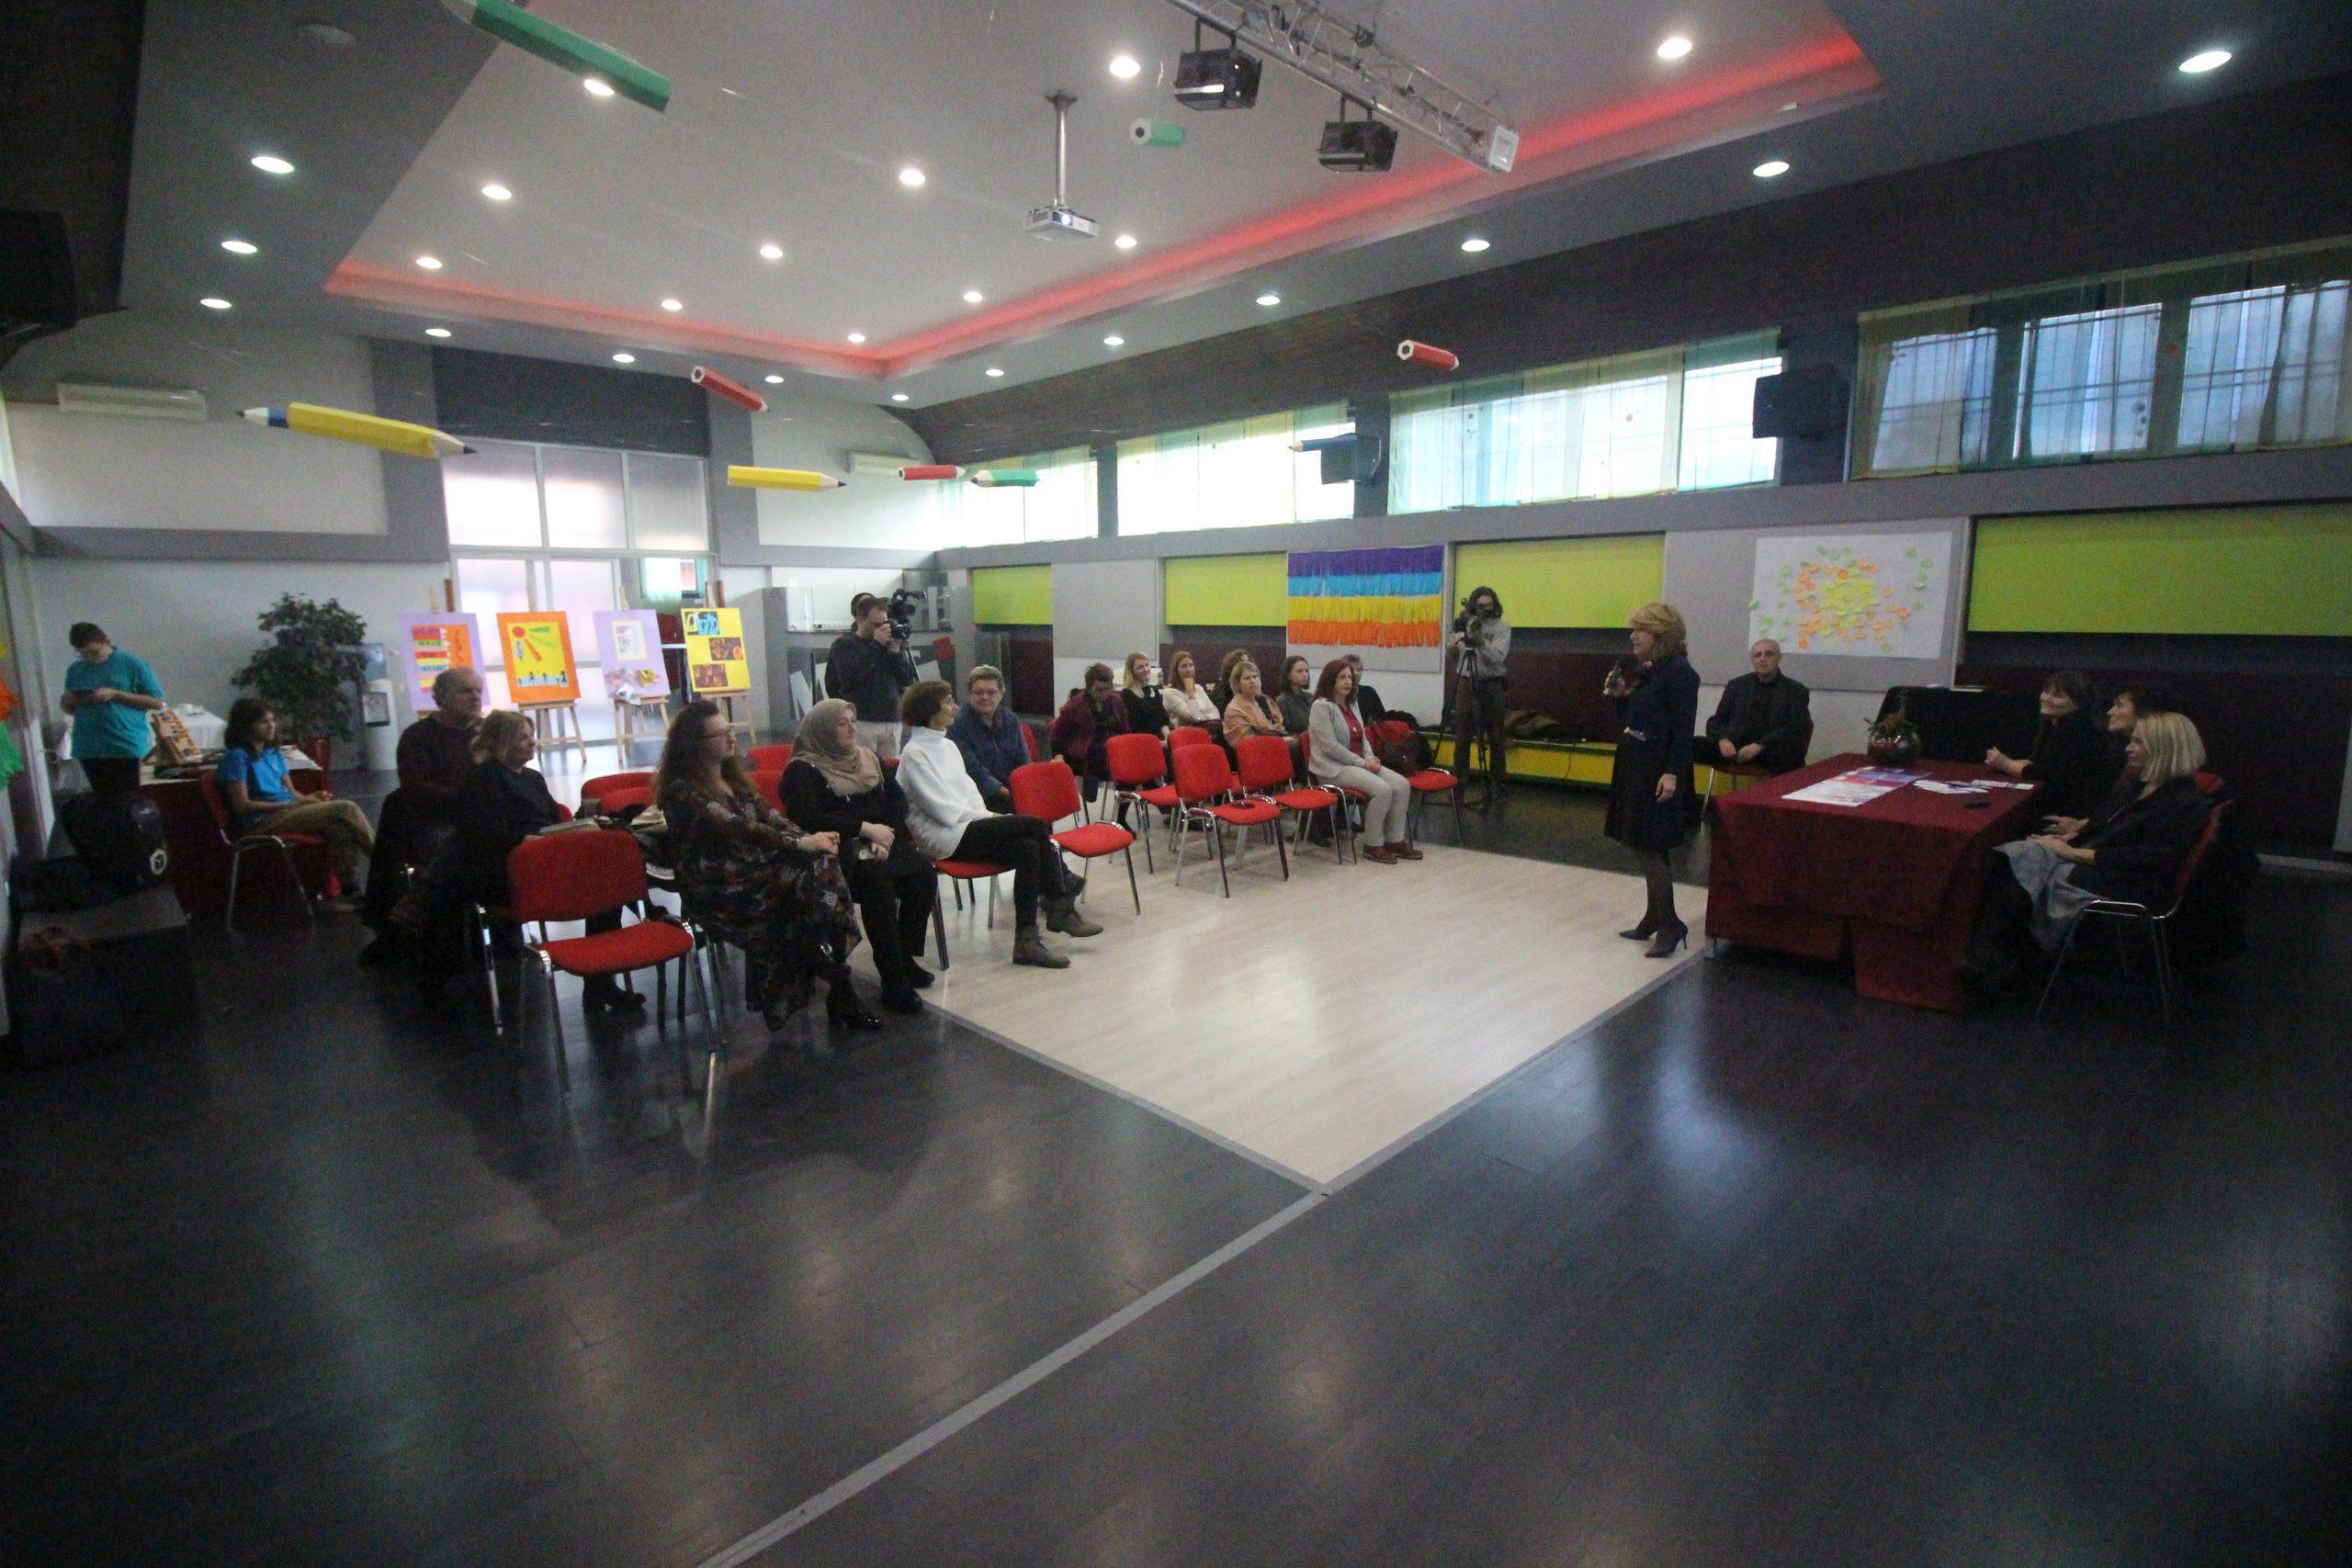 FOTO: U Osnovnoj školi Matije Gupca predstavljeni rezultati projekta In Medias ReStart